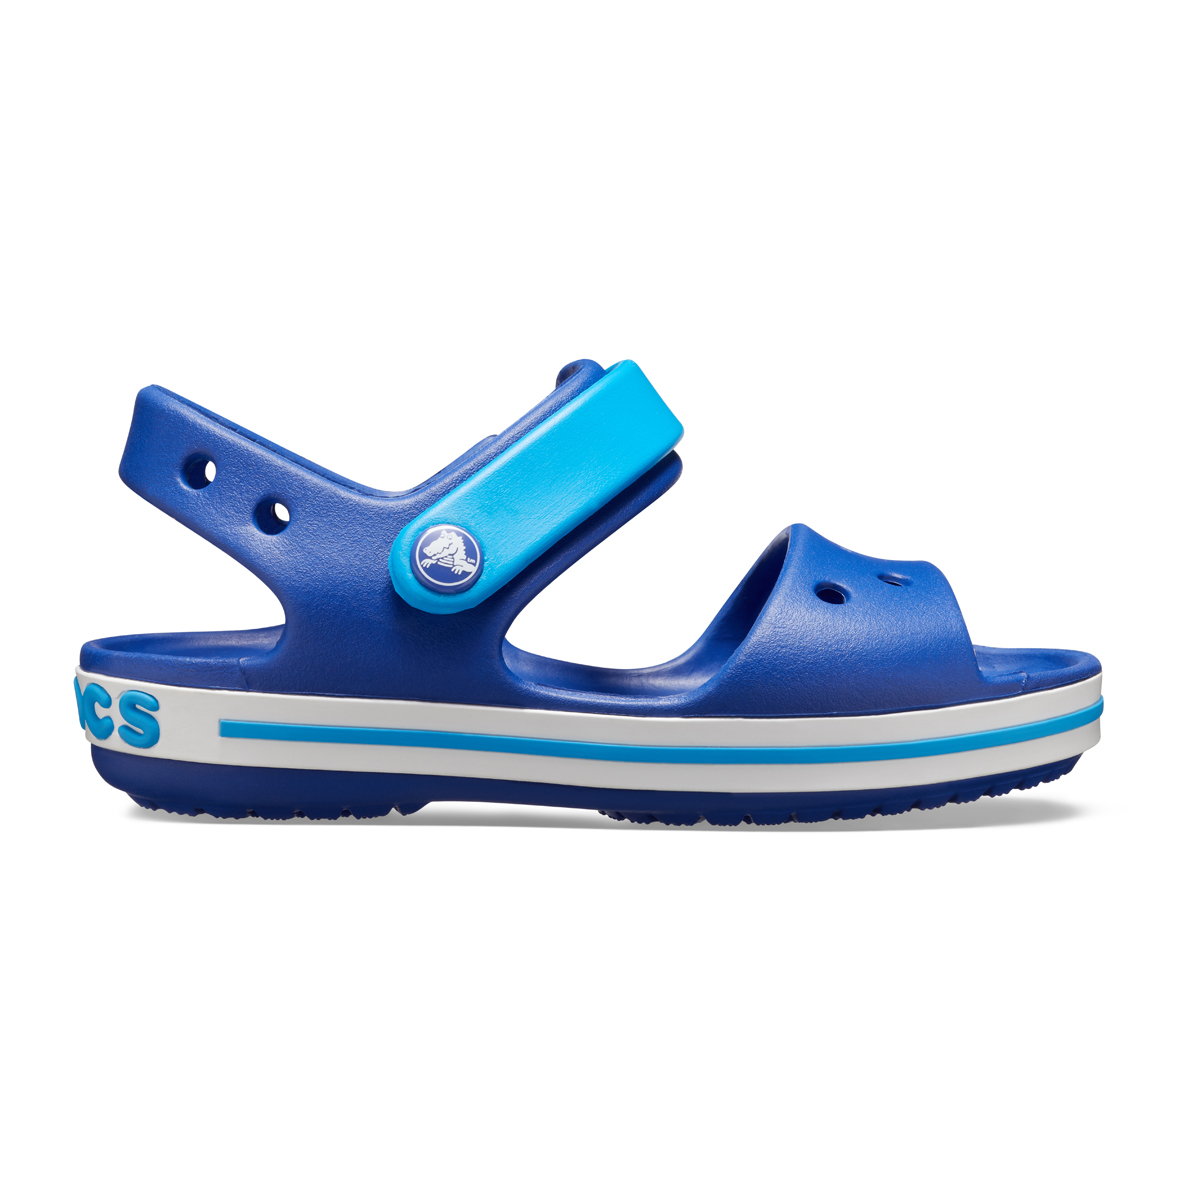 Crocs Crocband Sandal Kids - Gök Mavisi/Okyanus